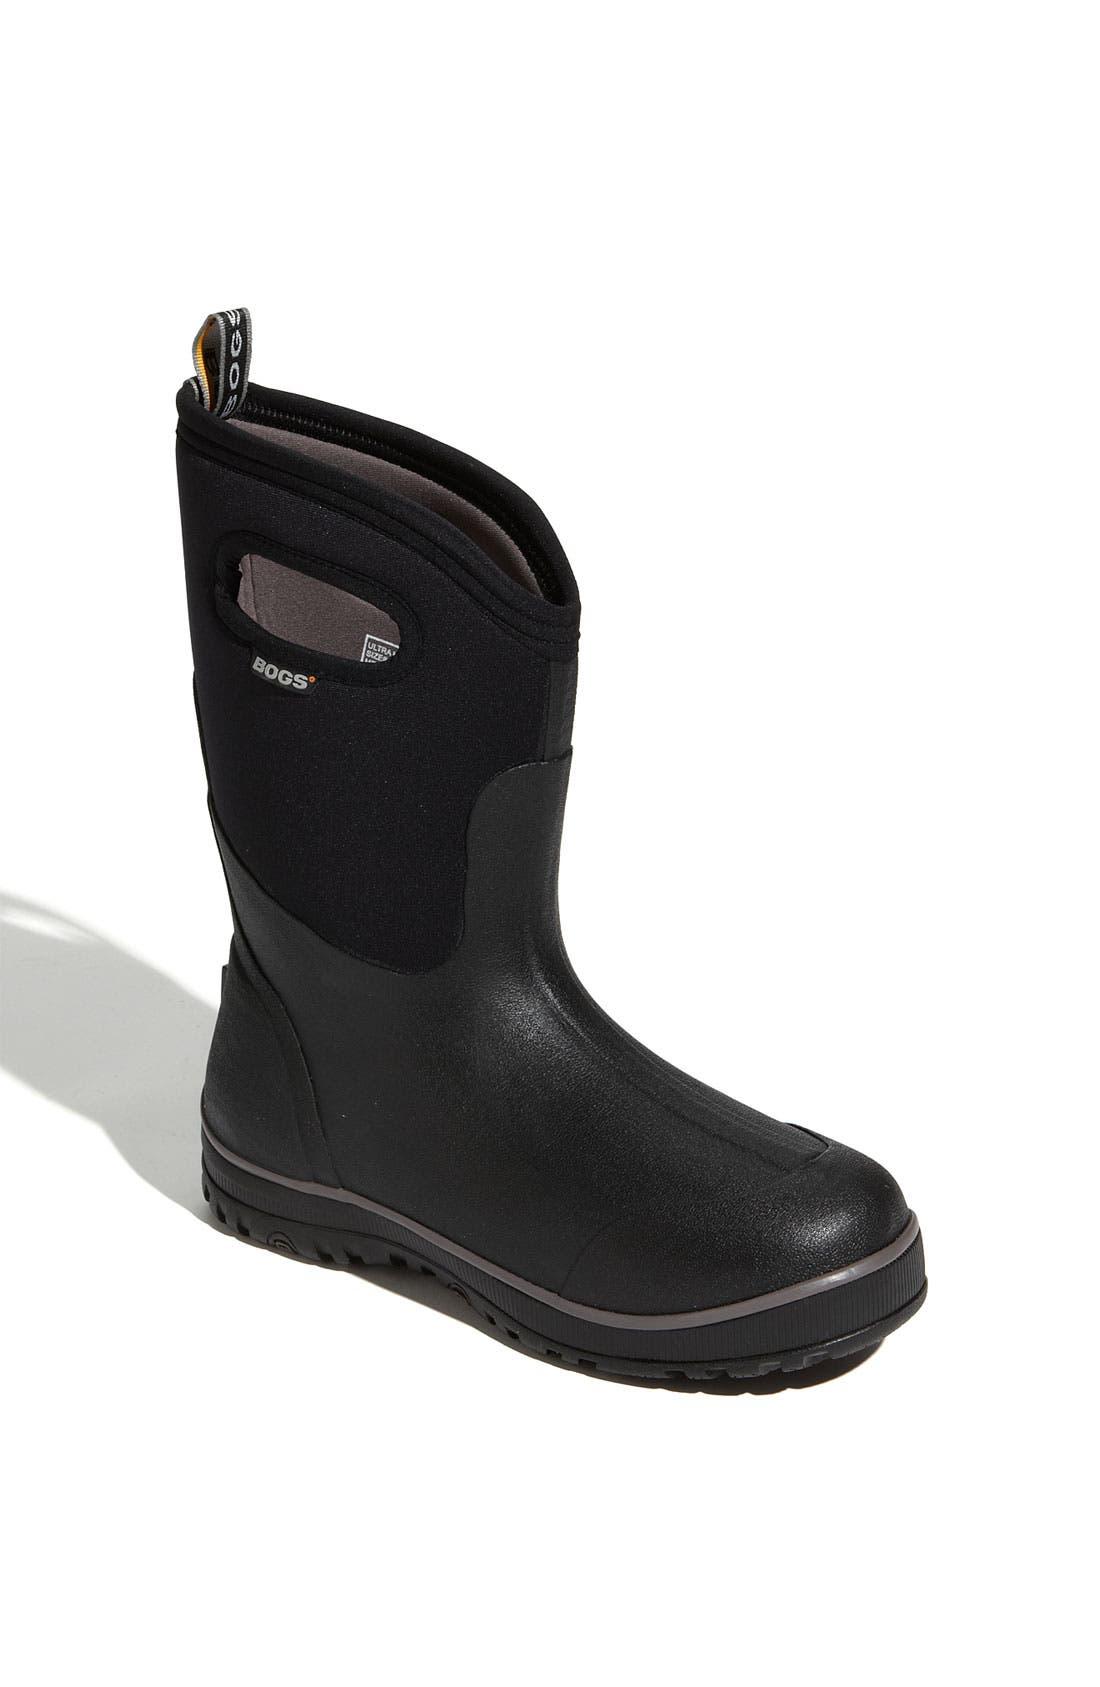 Main Image - Bogs 'Classic Ultra' Mid High Rain Boot   (Men)